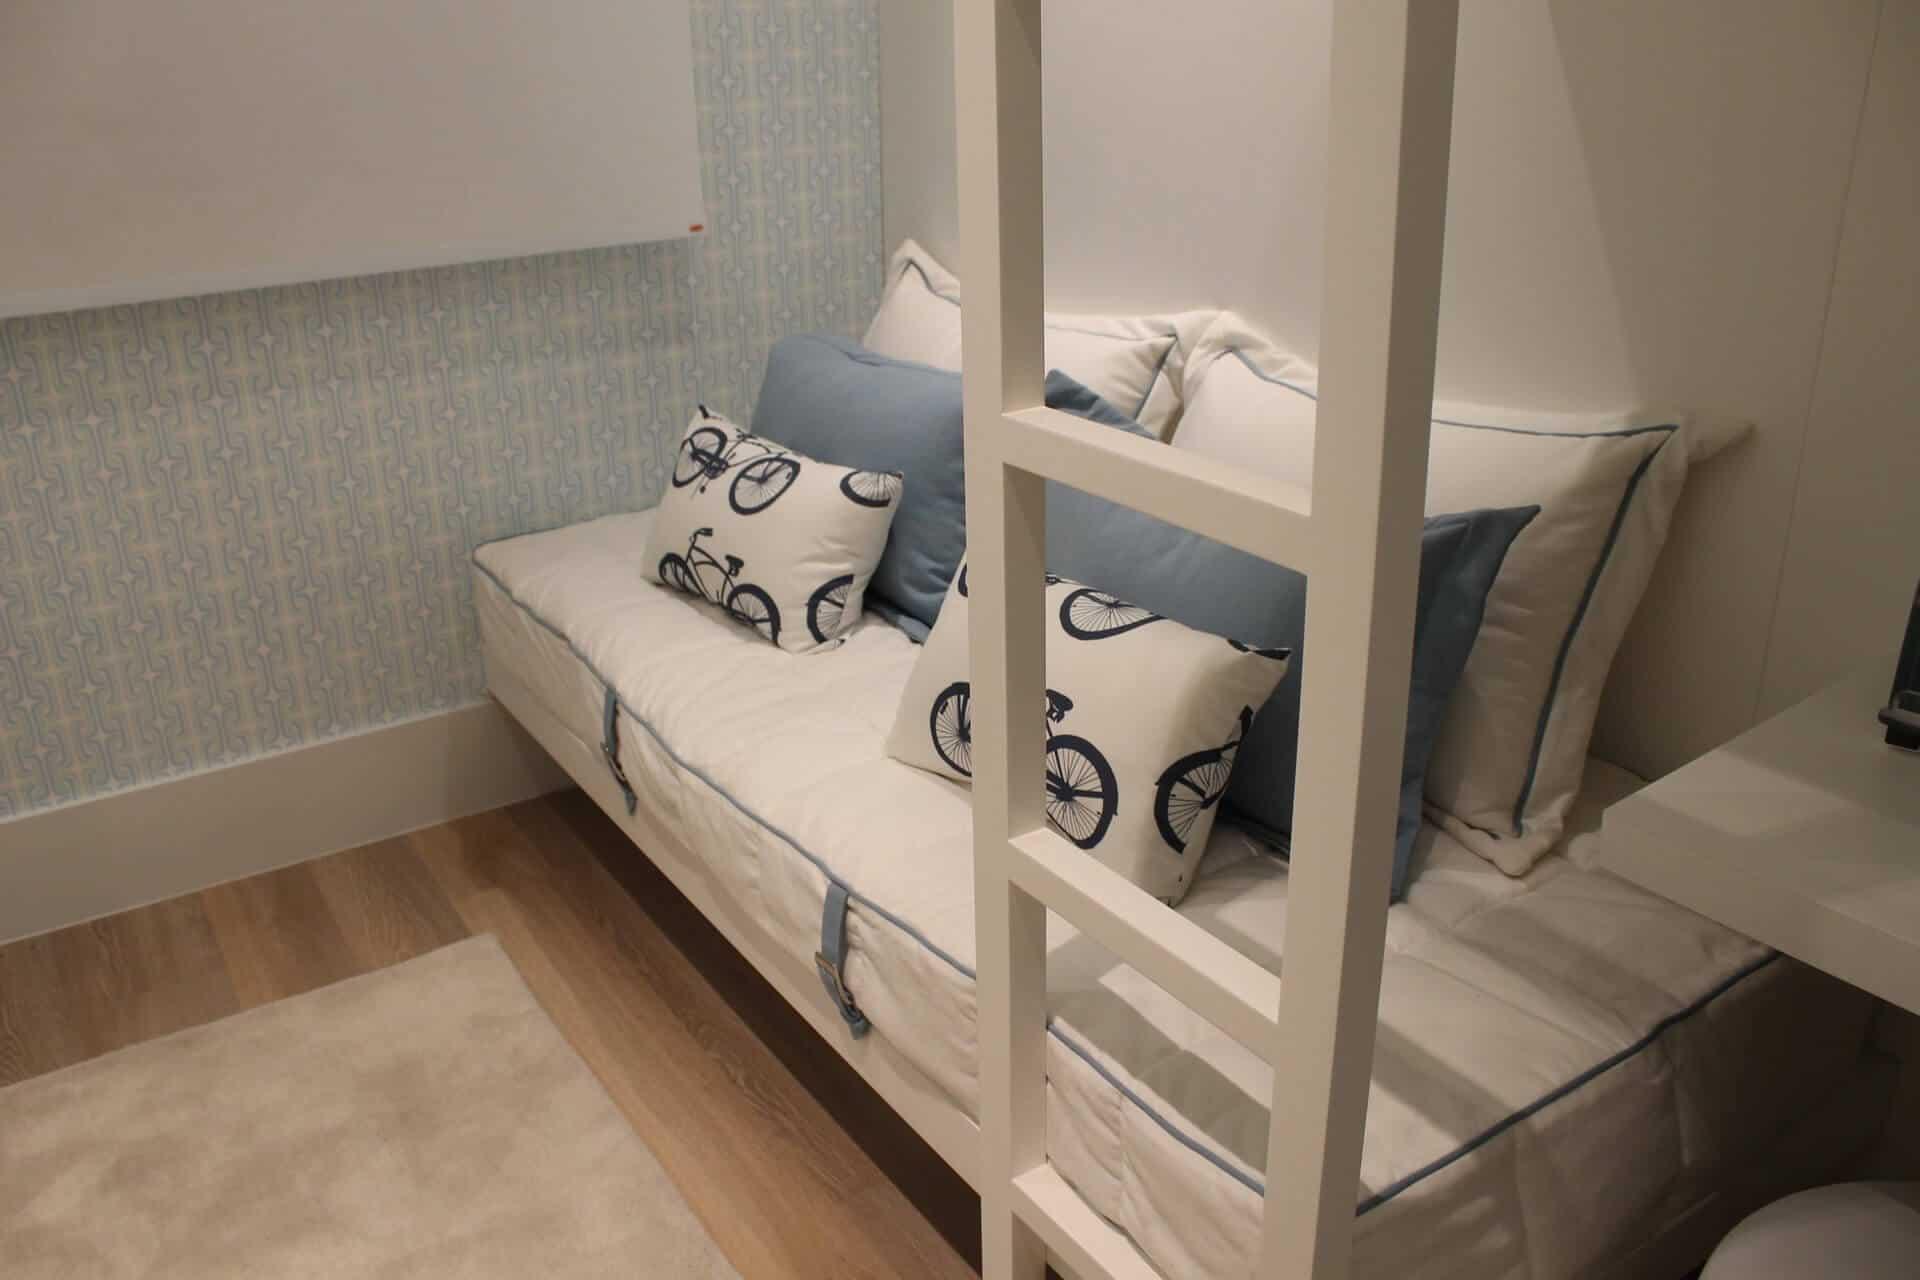 dormitorio-planejado_moveis-sob-medida-galeria-52